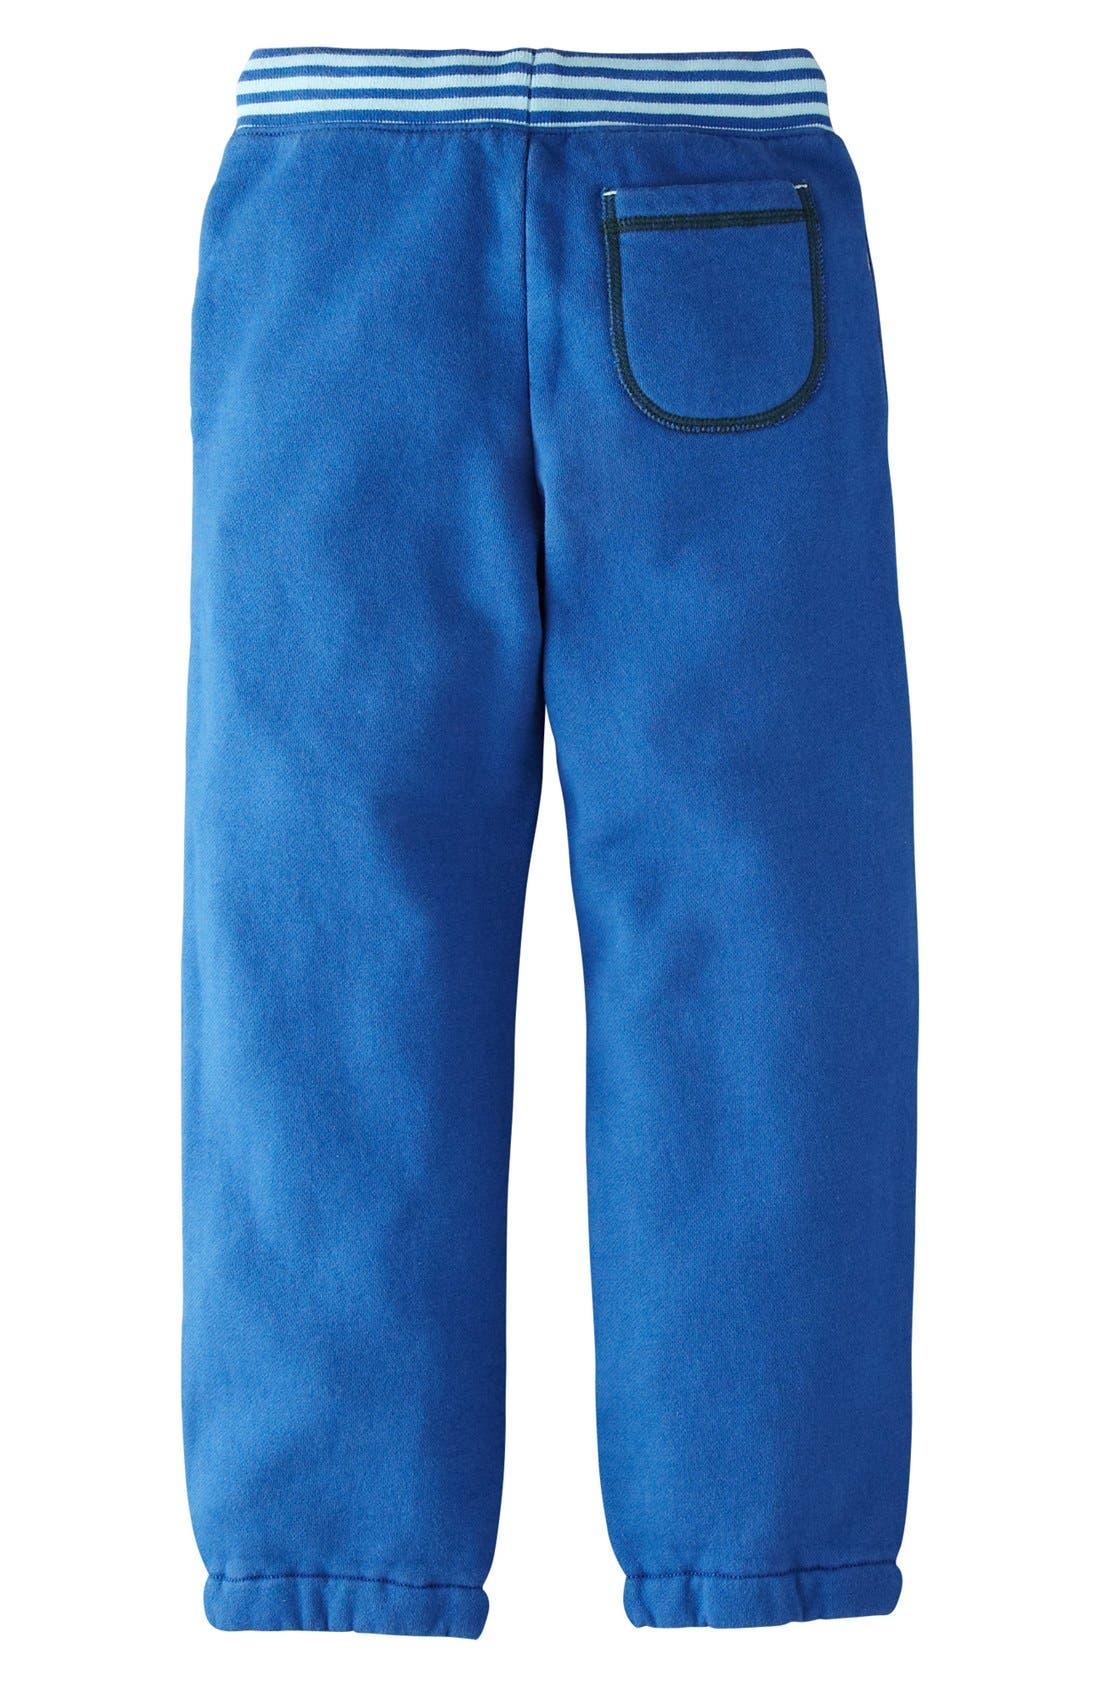 Alternate Image 2  - Mini Boden Track Pants (Toddler Boys, Little Boys & Big Boys)